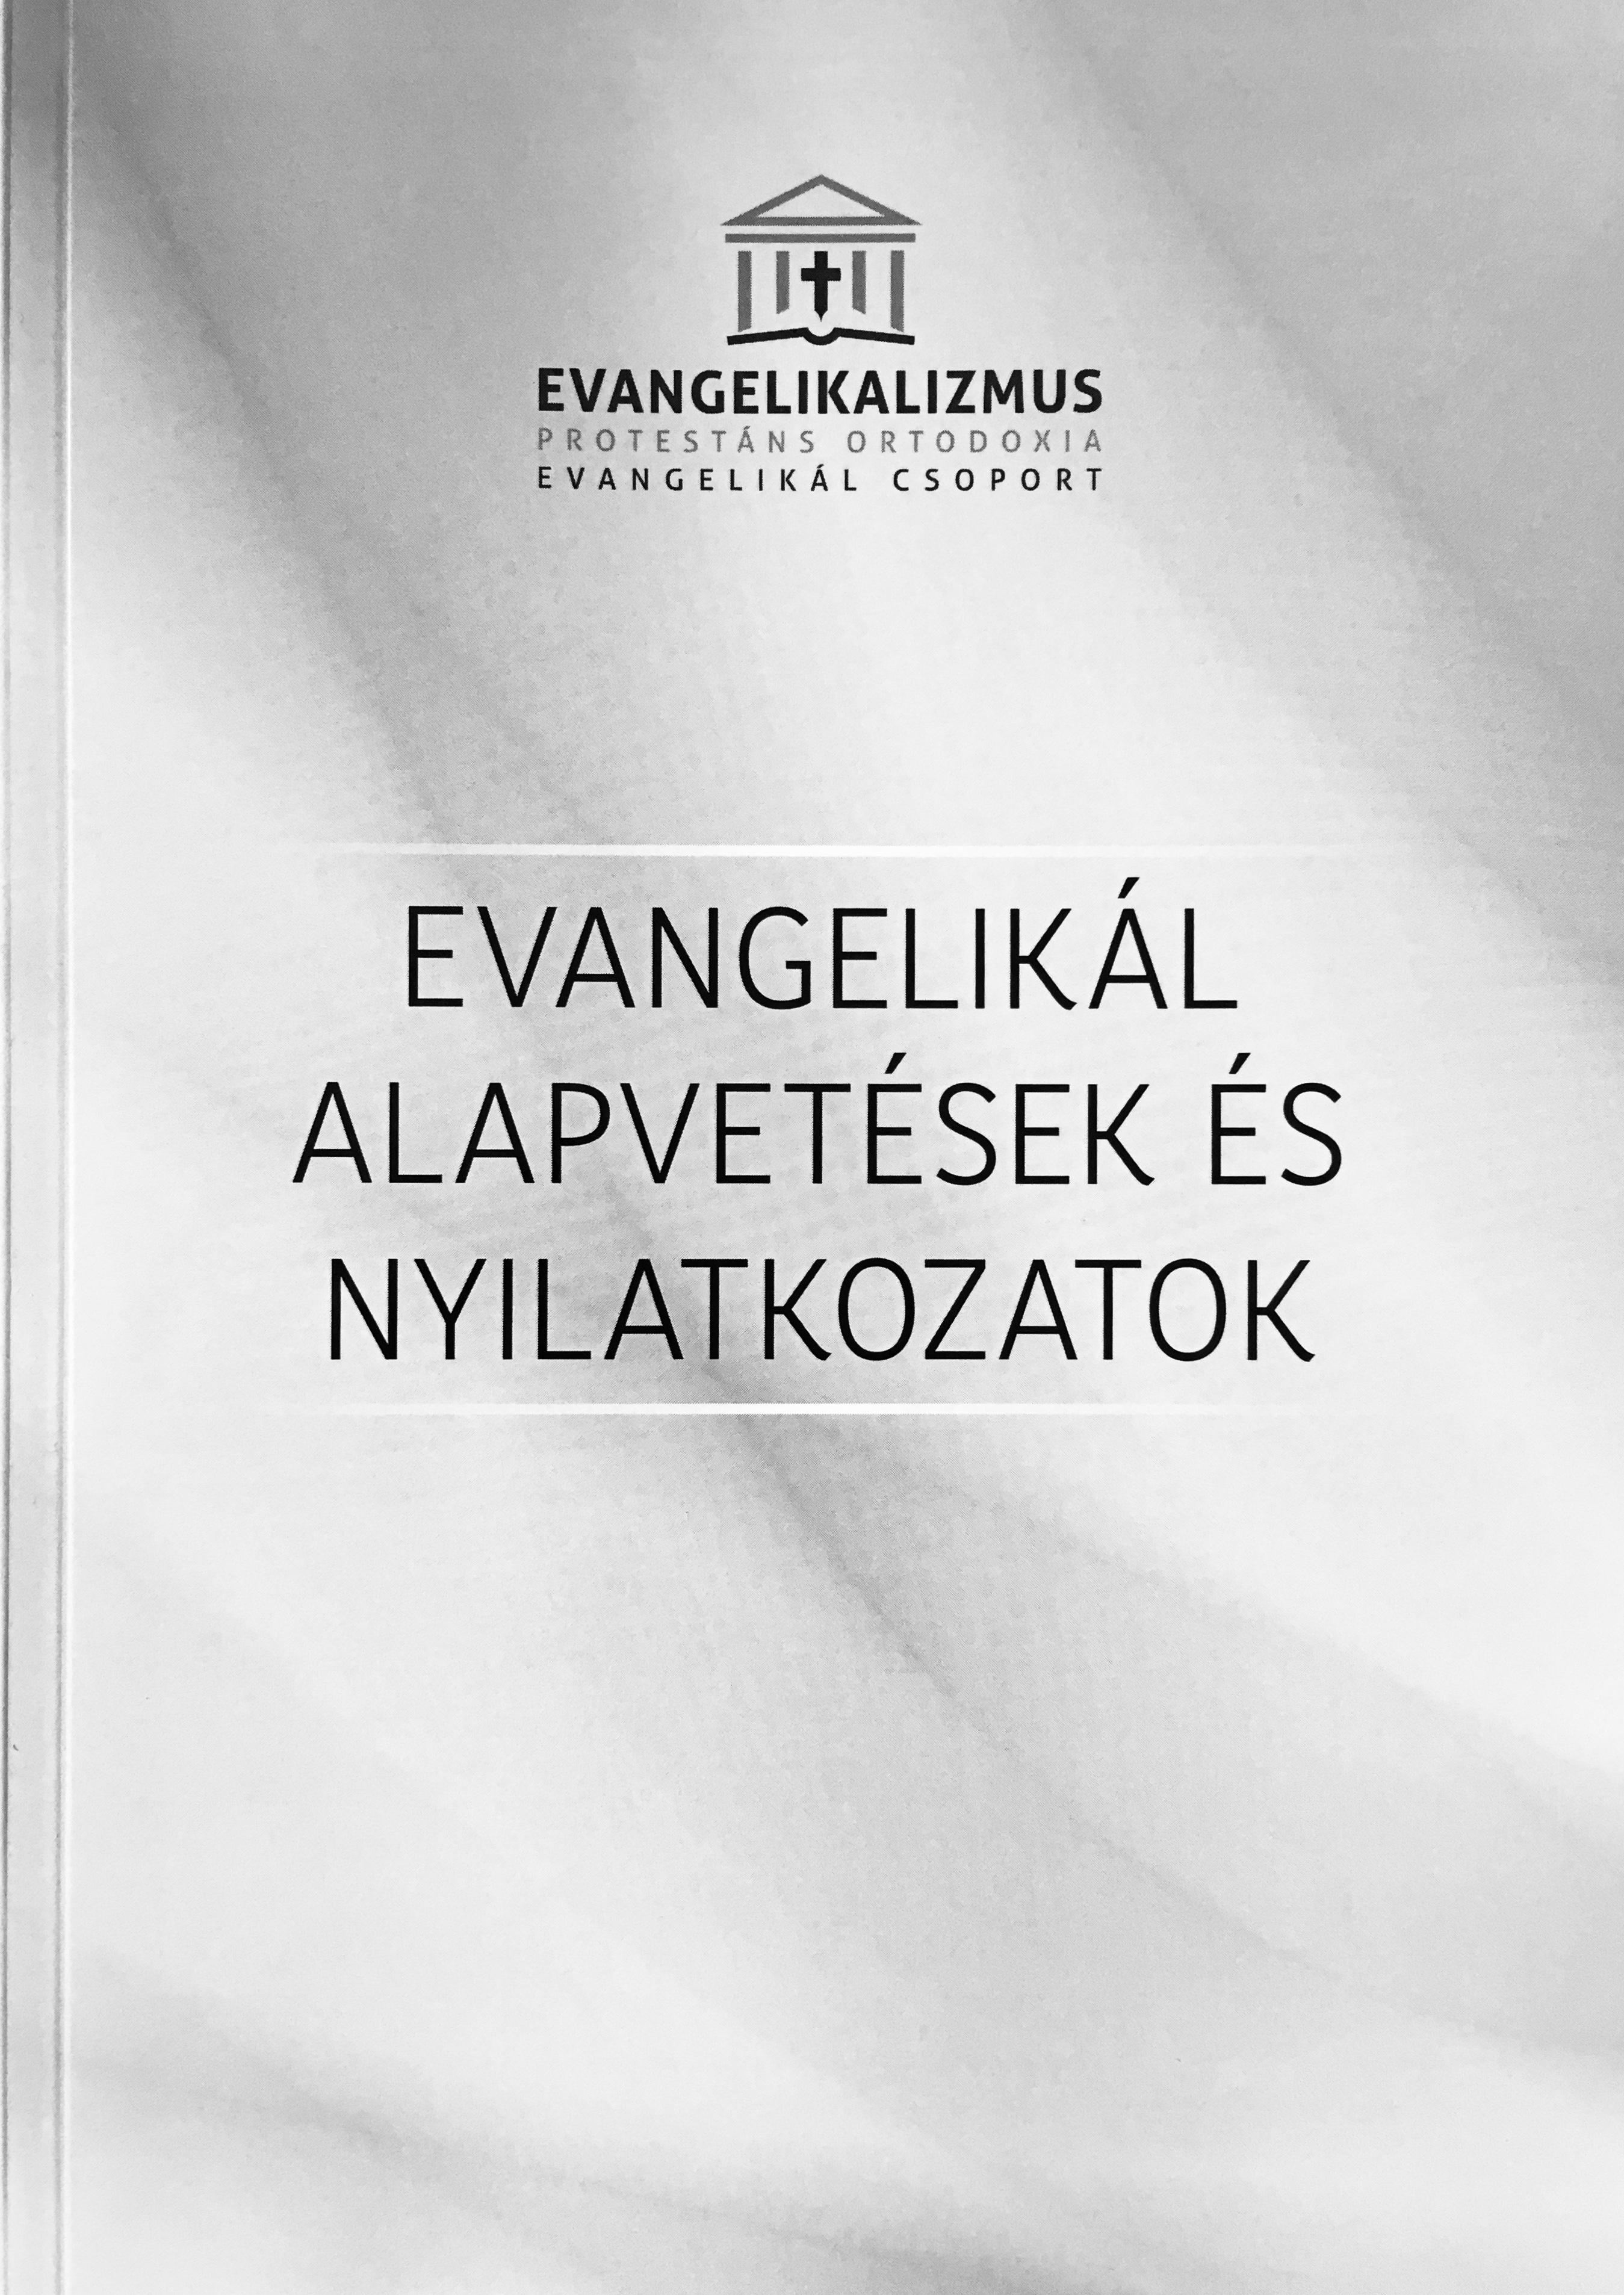 Evangelikalizmus